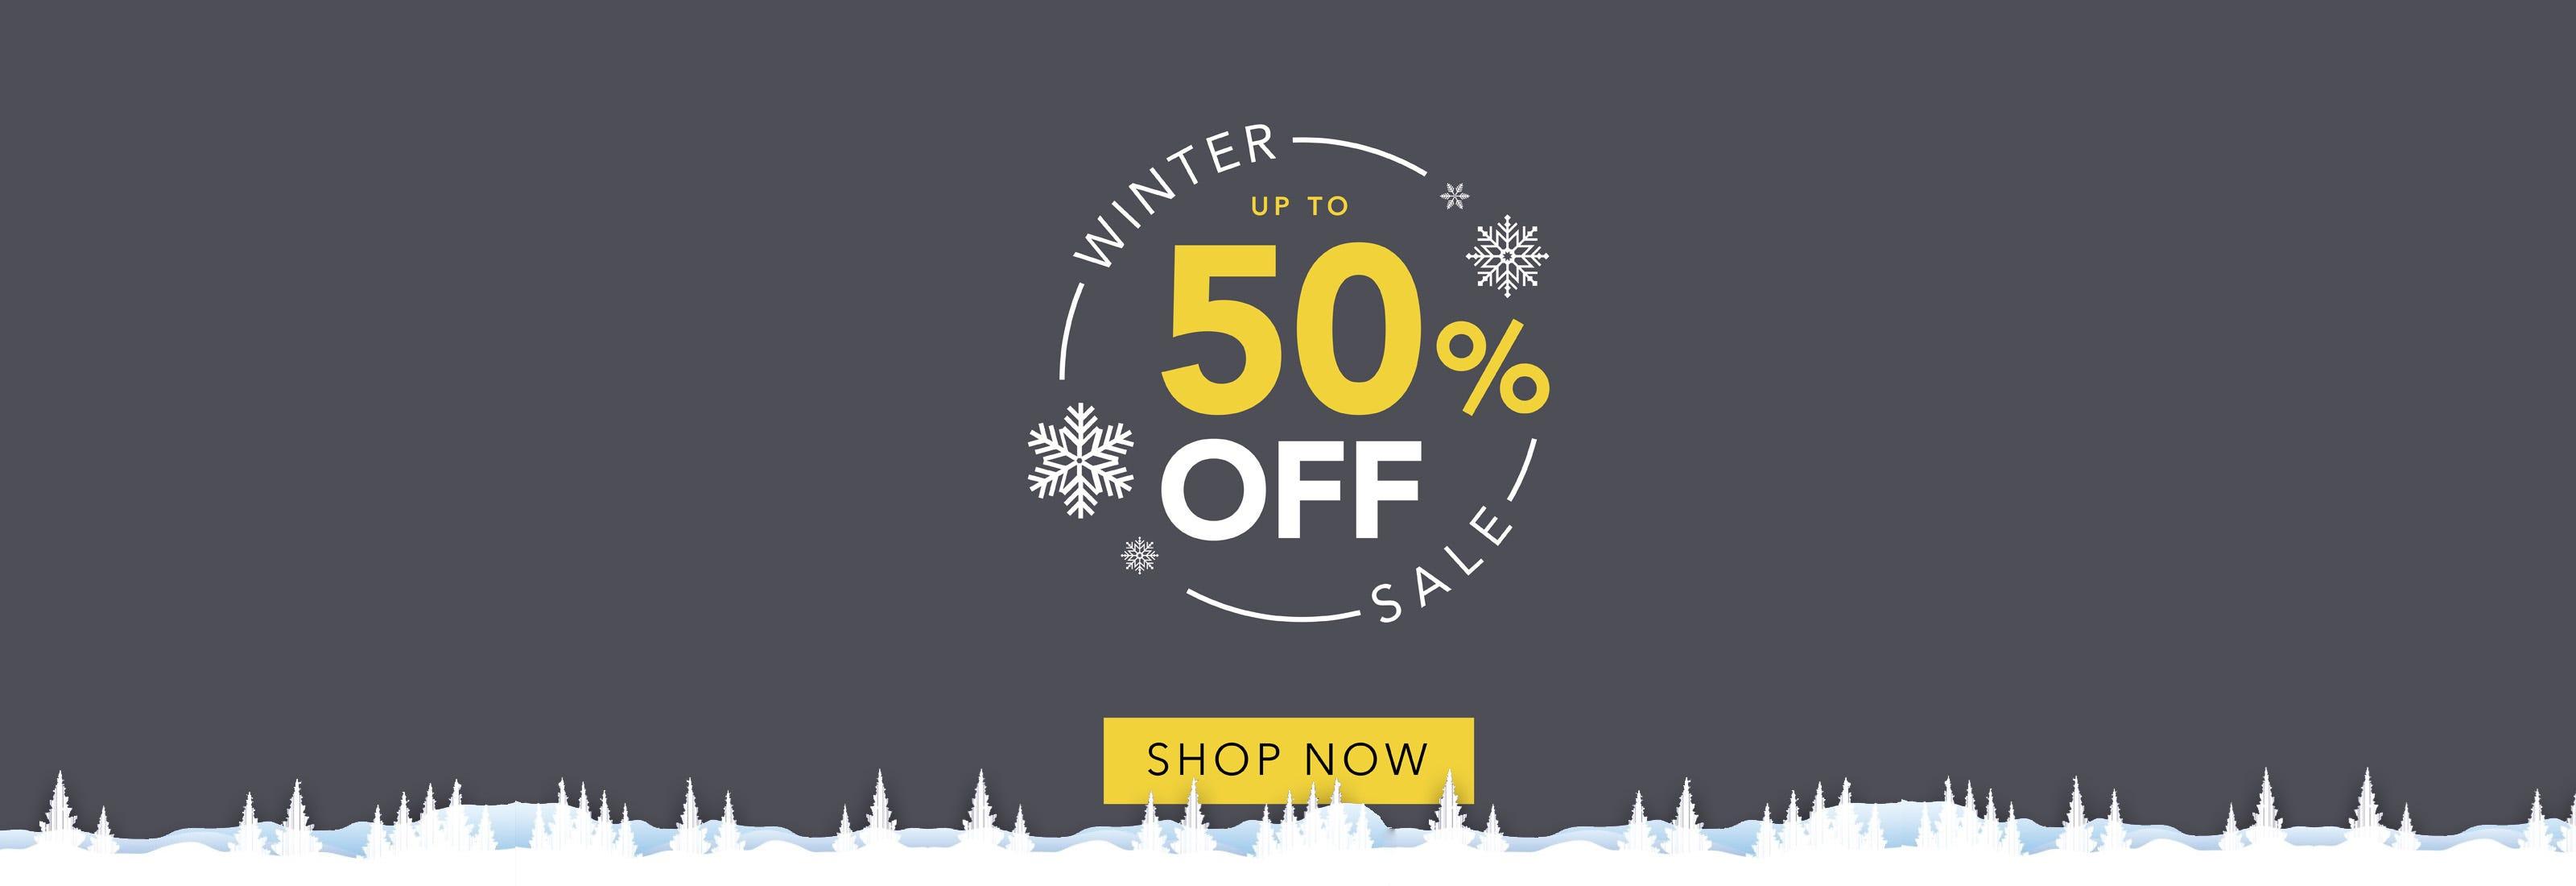 Bedeck Home Winter Bedding Sale